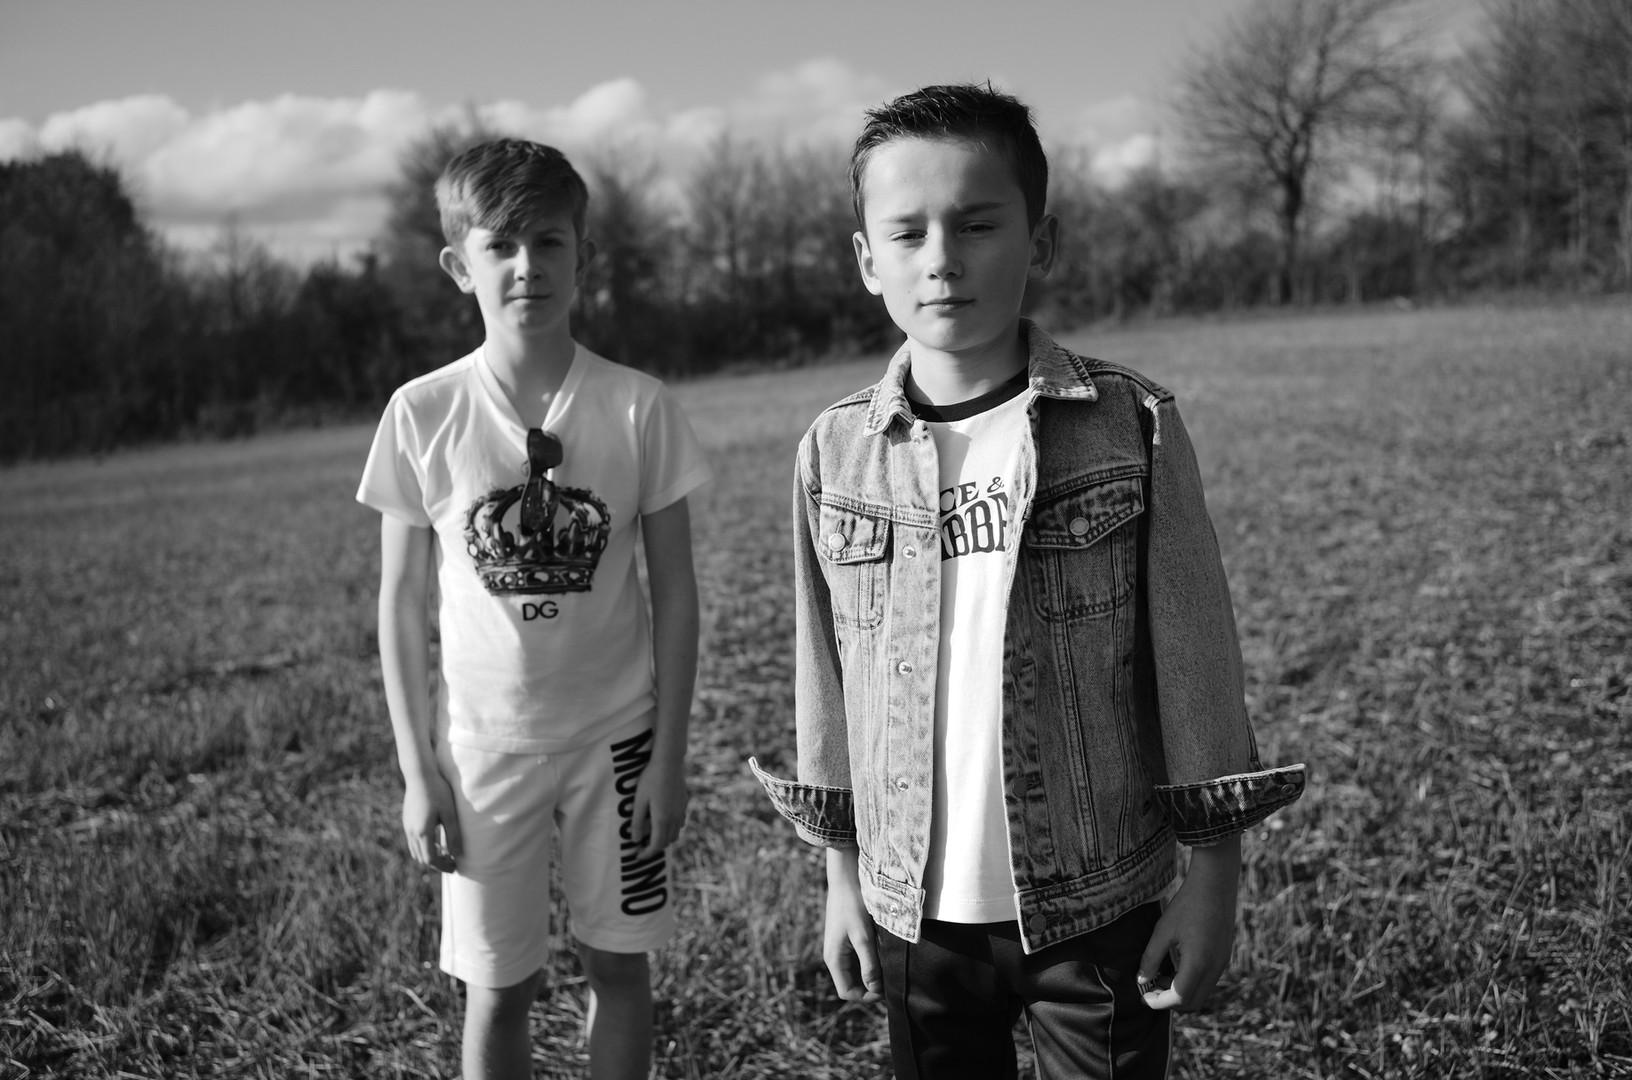 Boys day out 06 - Copy.jpg